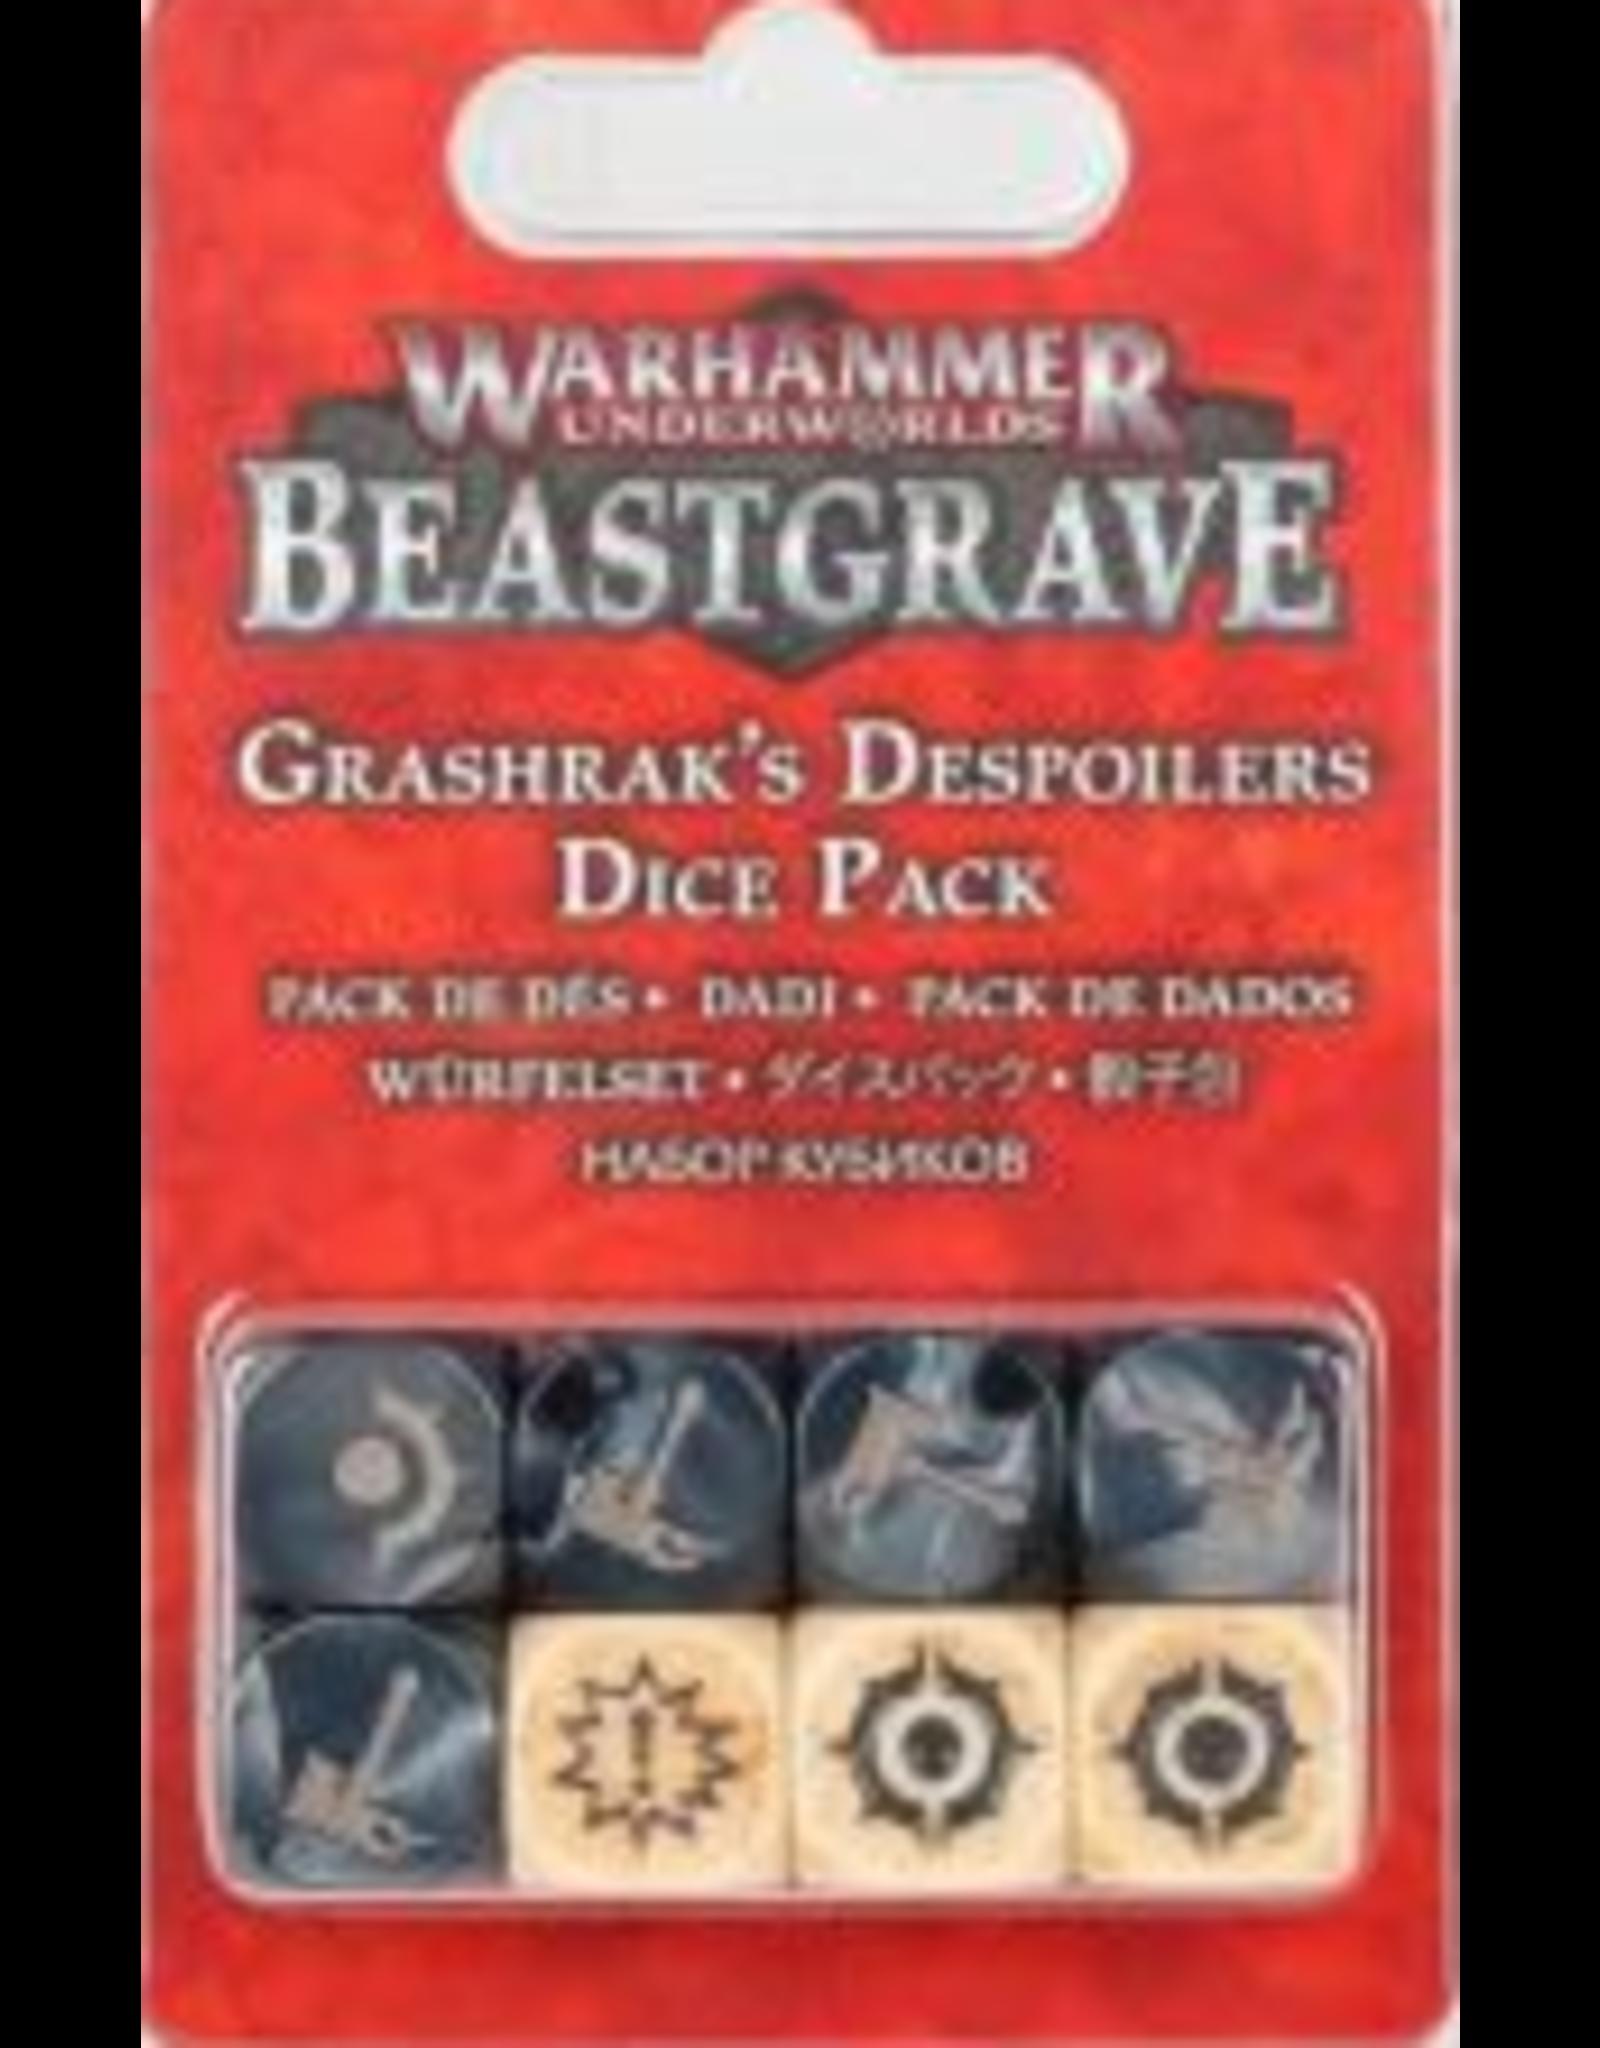 Games Workshop Warhammer Underworlds: Beastgrave Grashrak's Despoilers Dice Pack